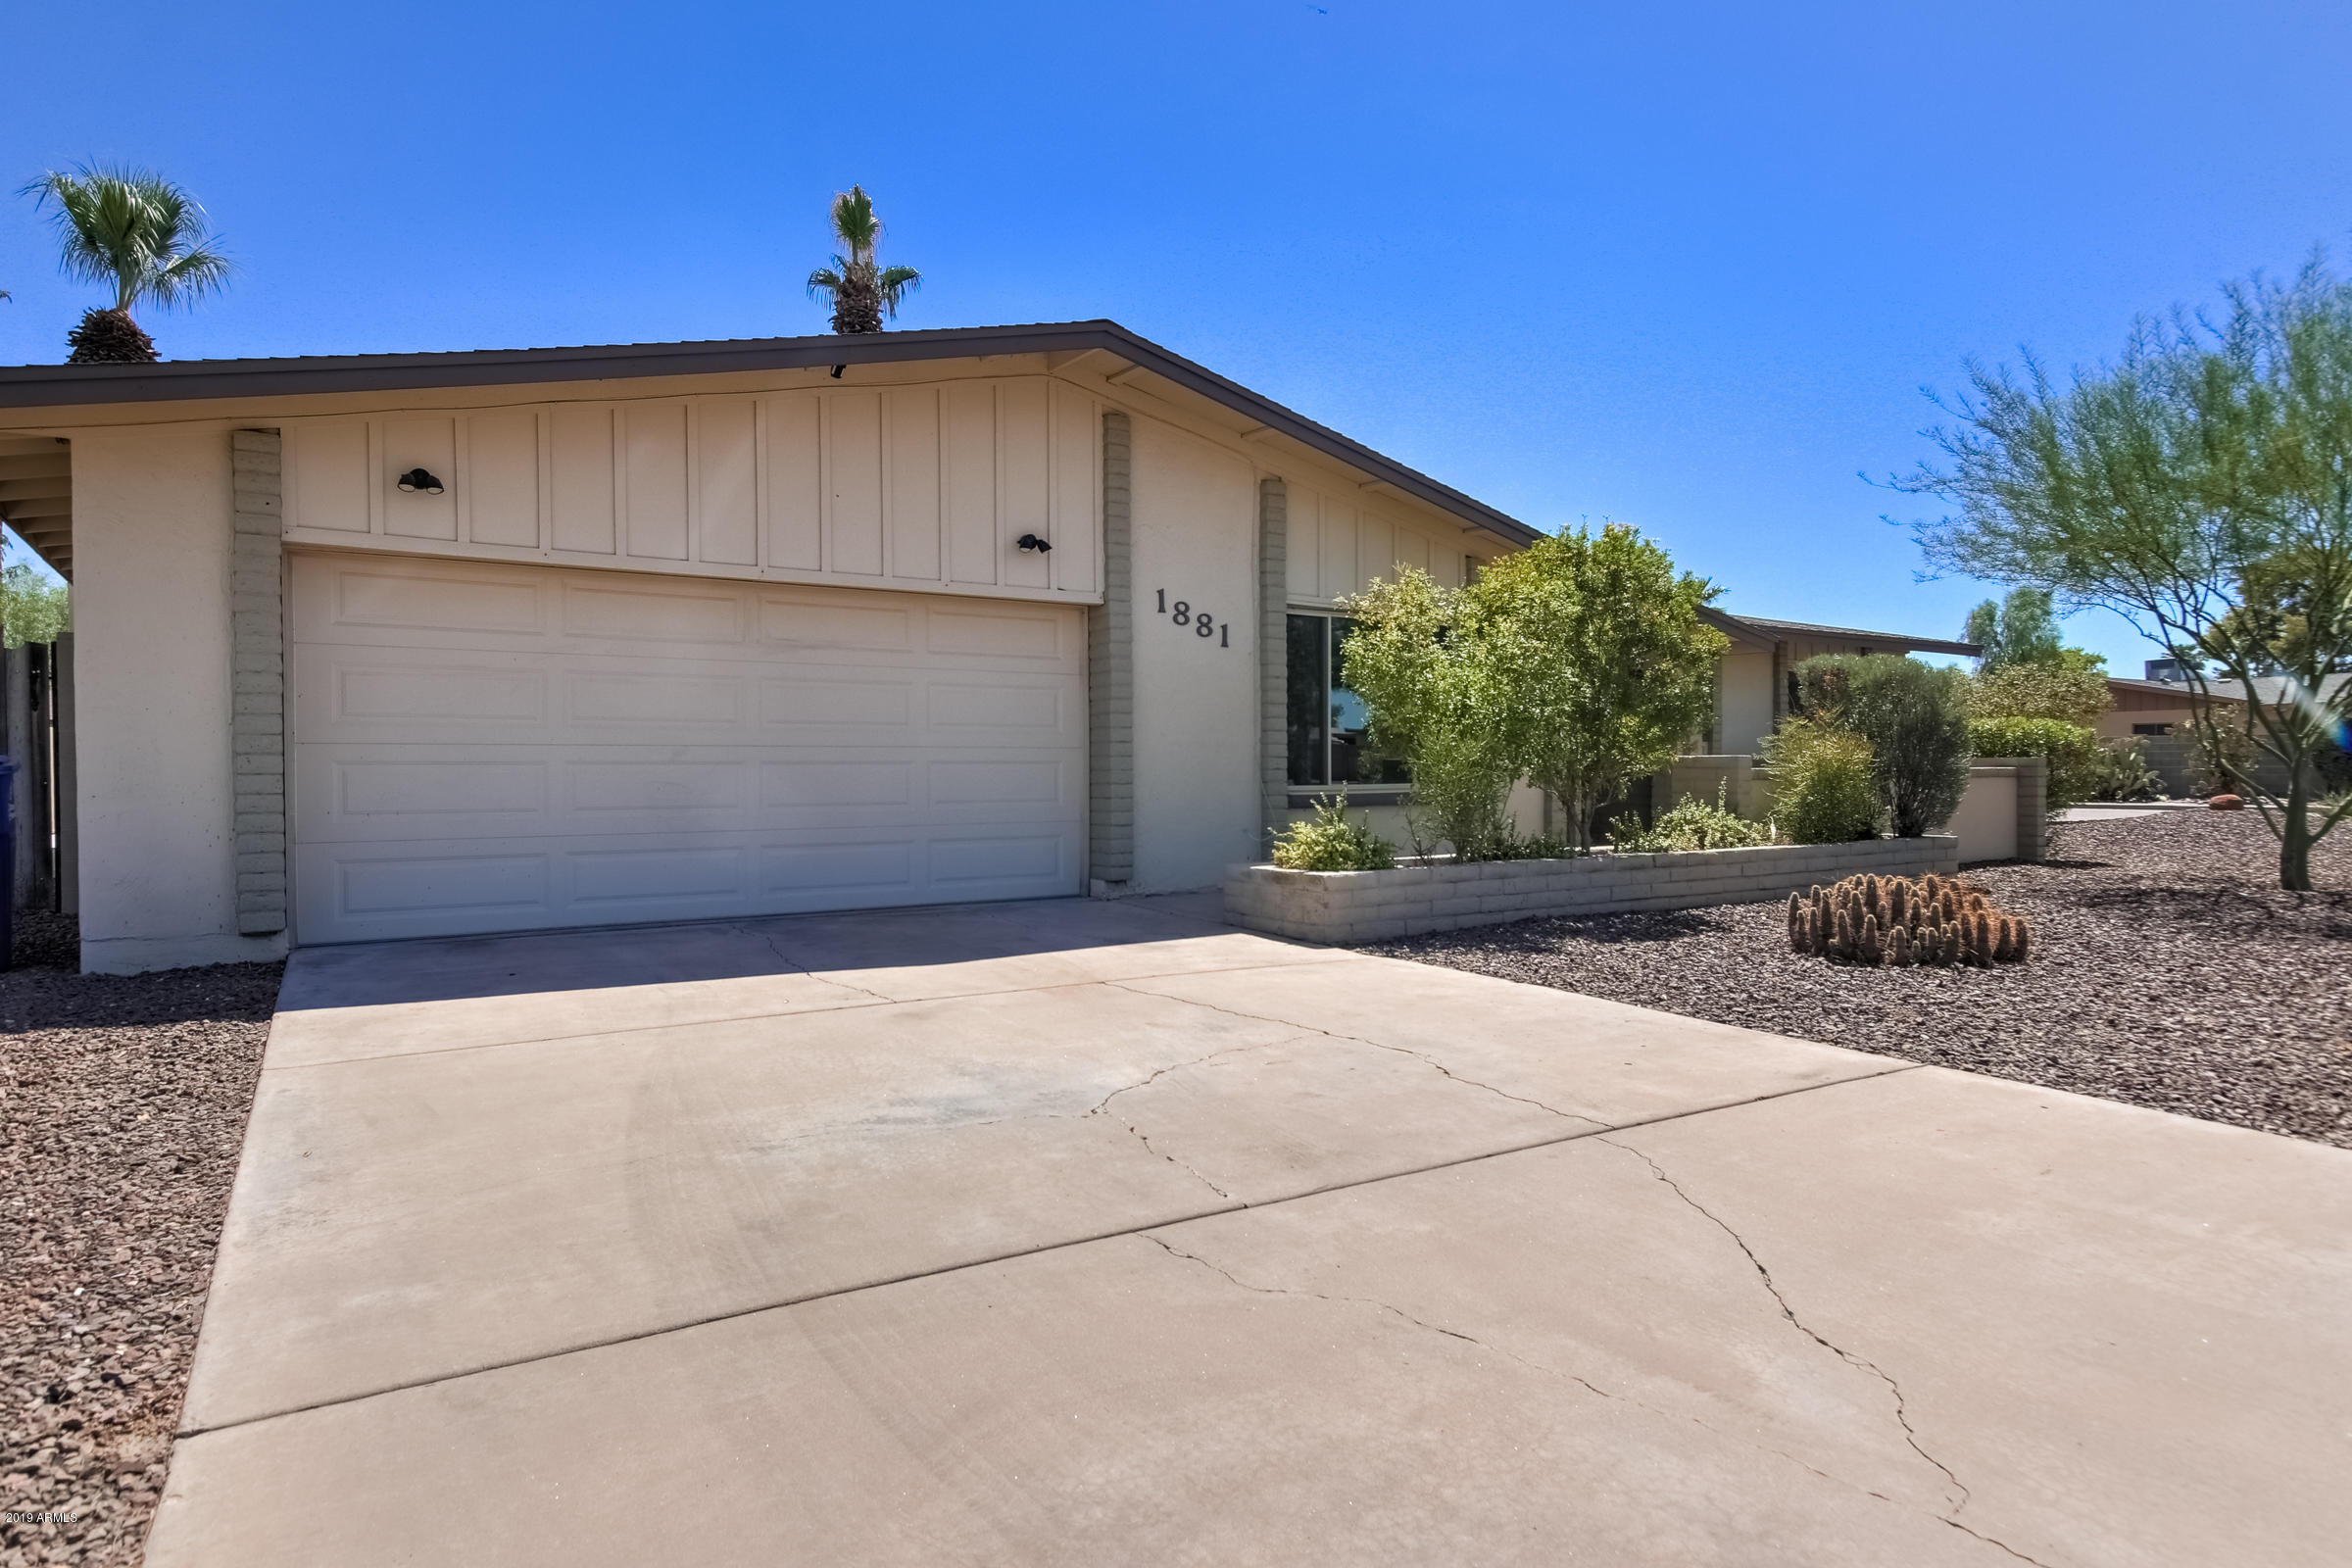 MLS 5964770 1881 E JULIE Drive, Tempe, AZ 85283 Tempe AZ Continental East